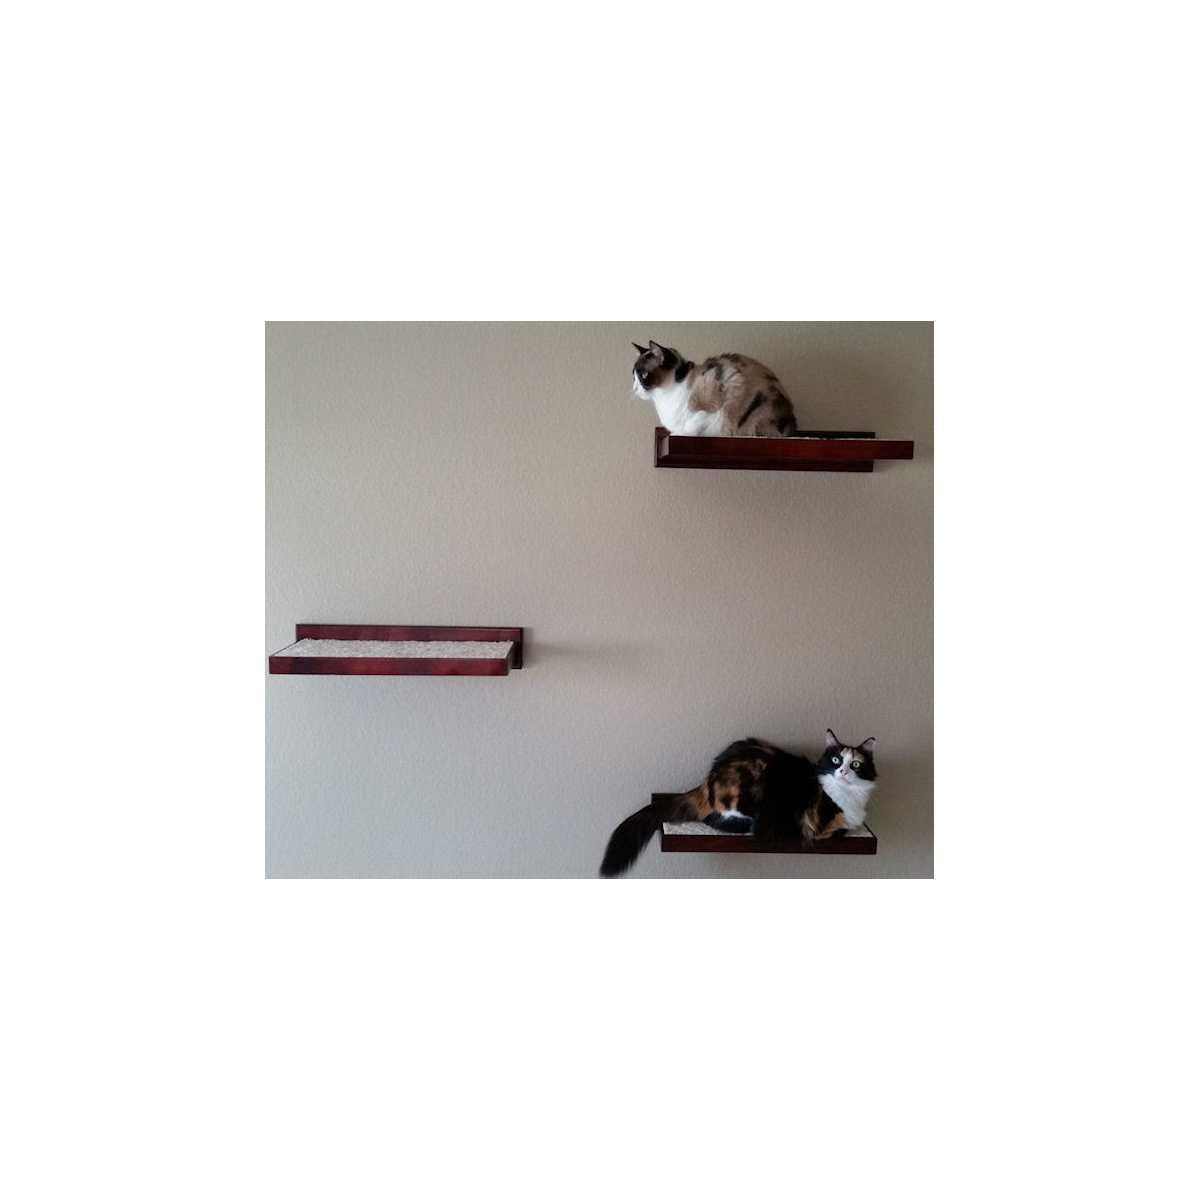 wall mounted cat furniture. Wall Mounted Cat Furniture. Furniture Climbing Shelves